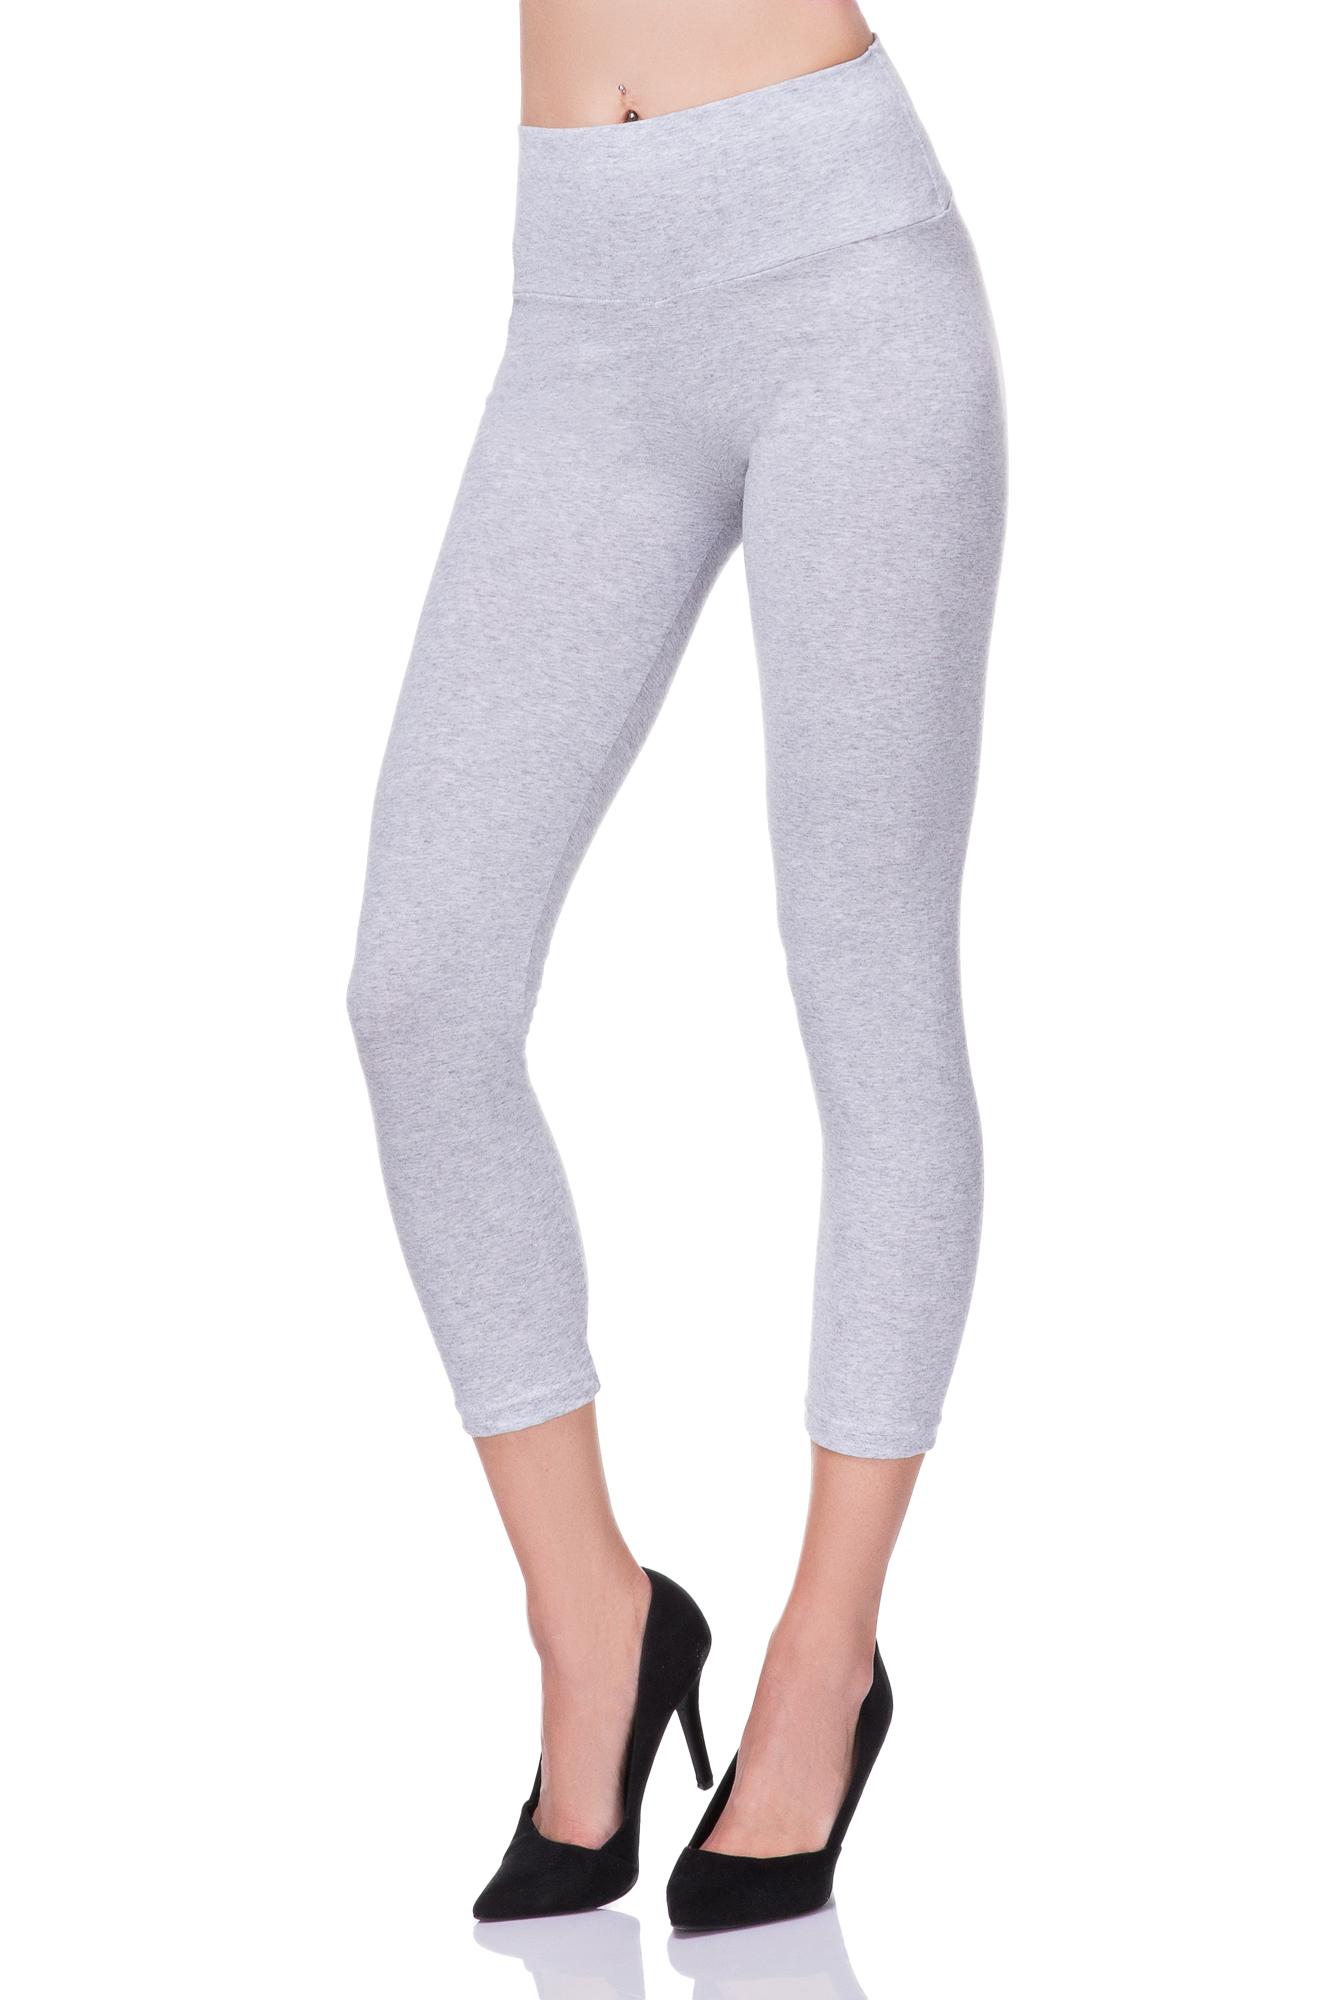 Women Capri Length Leggings Denim Imitation 3//4 Length Comfy Pants One Size FS07